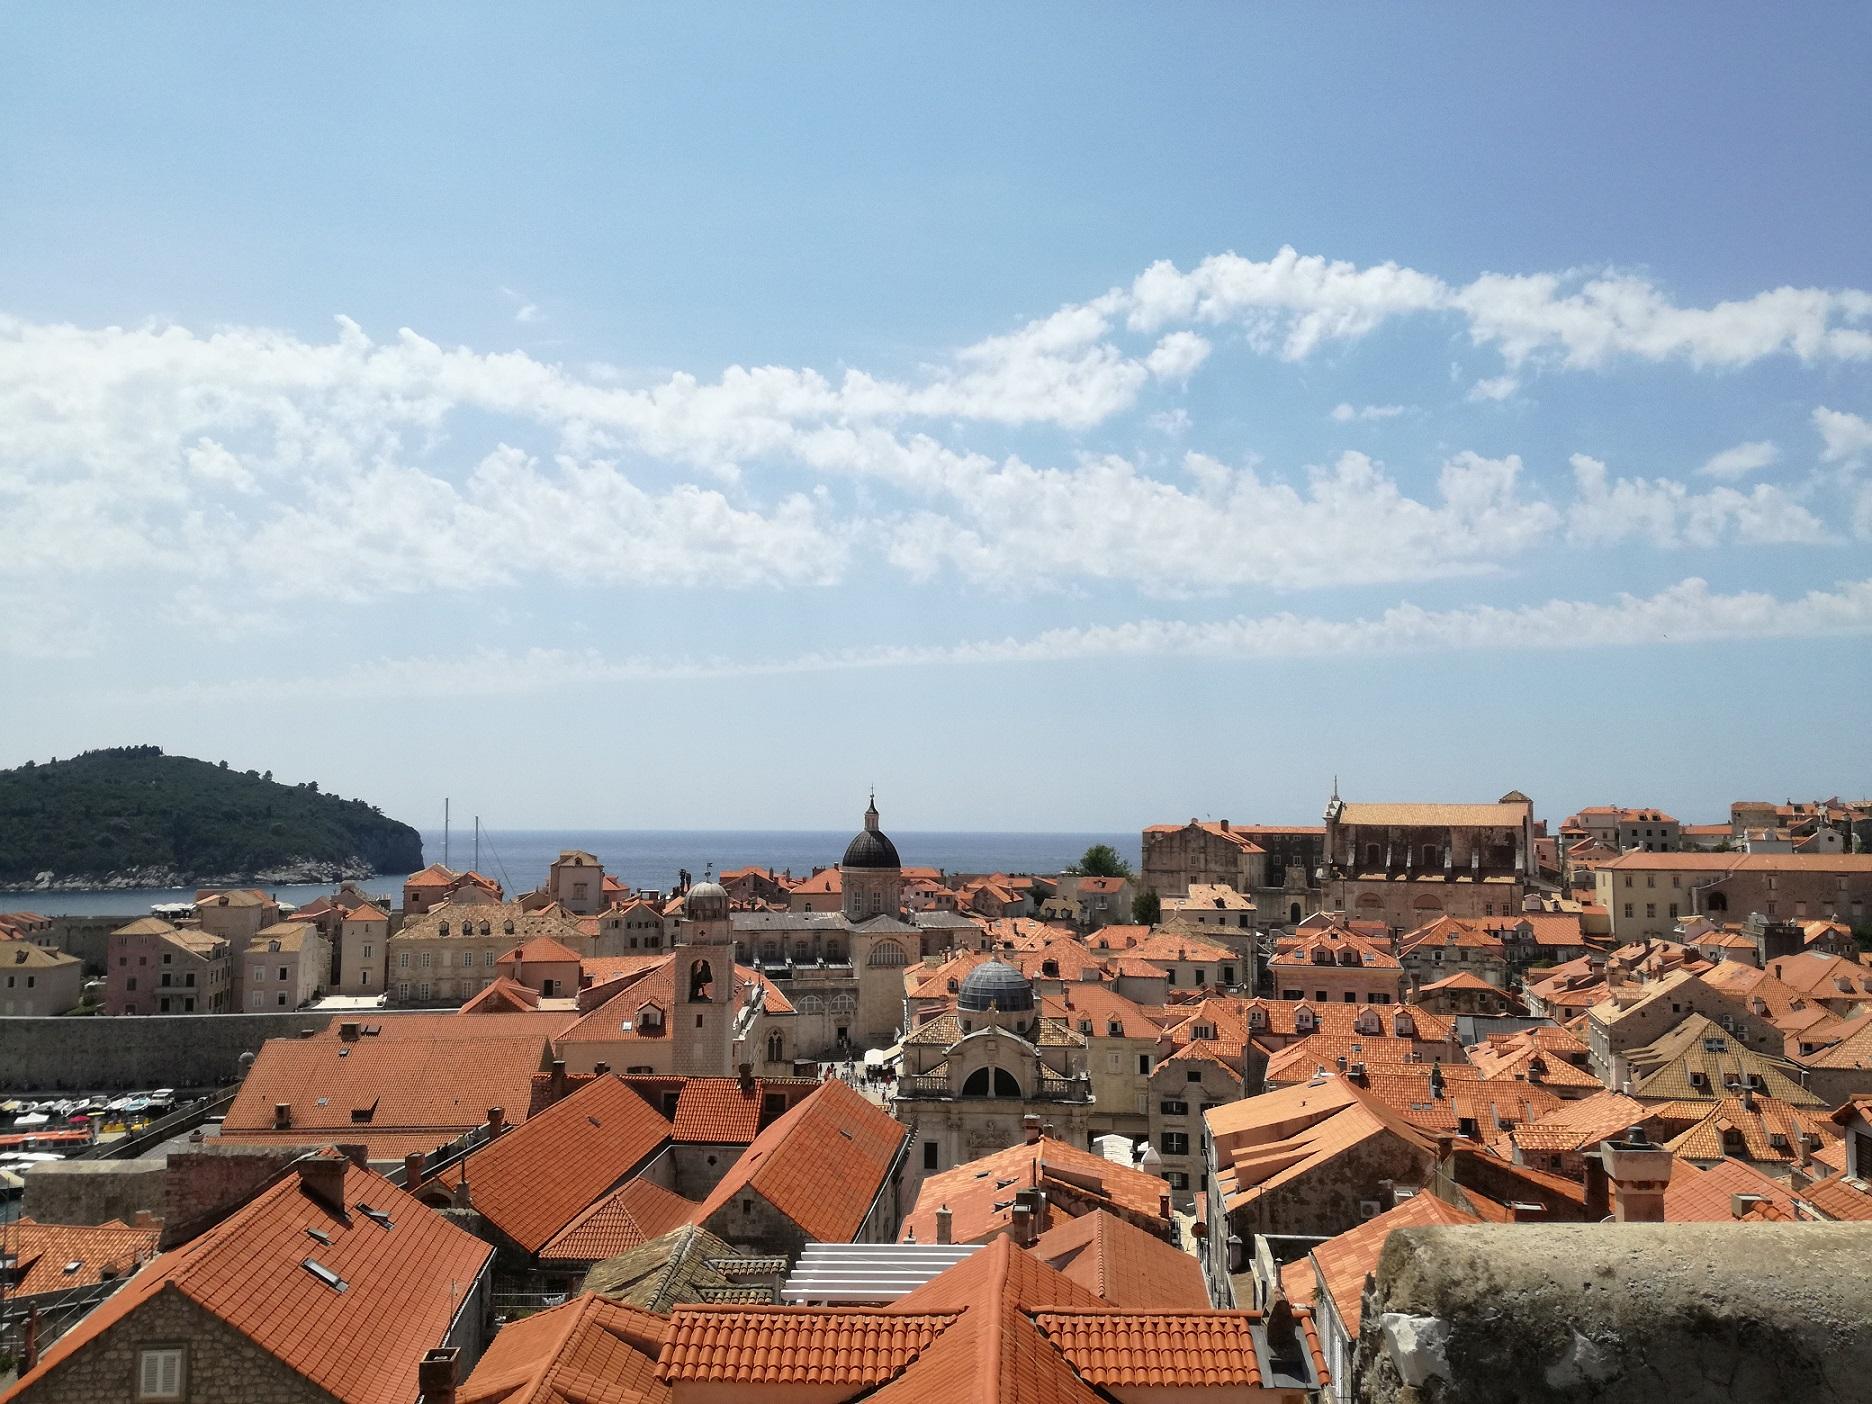 Dubrovnik IMG 20180712 115538 Please Credit Rachel McFaul 2